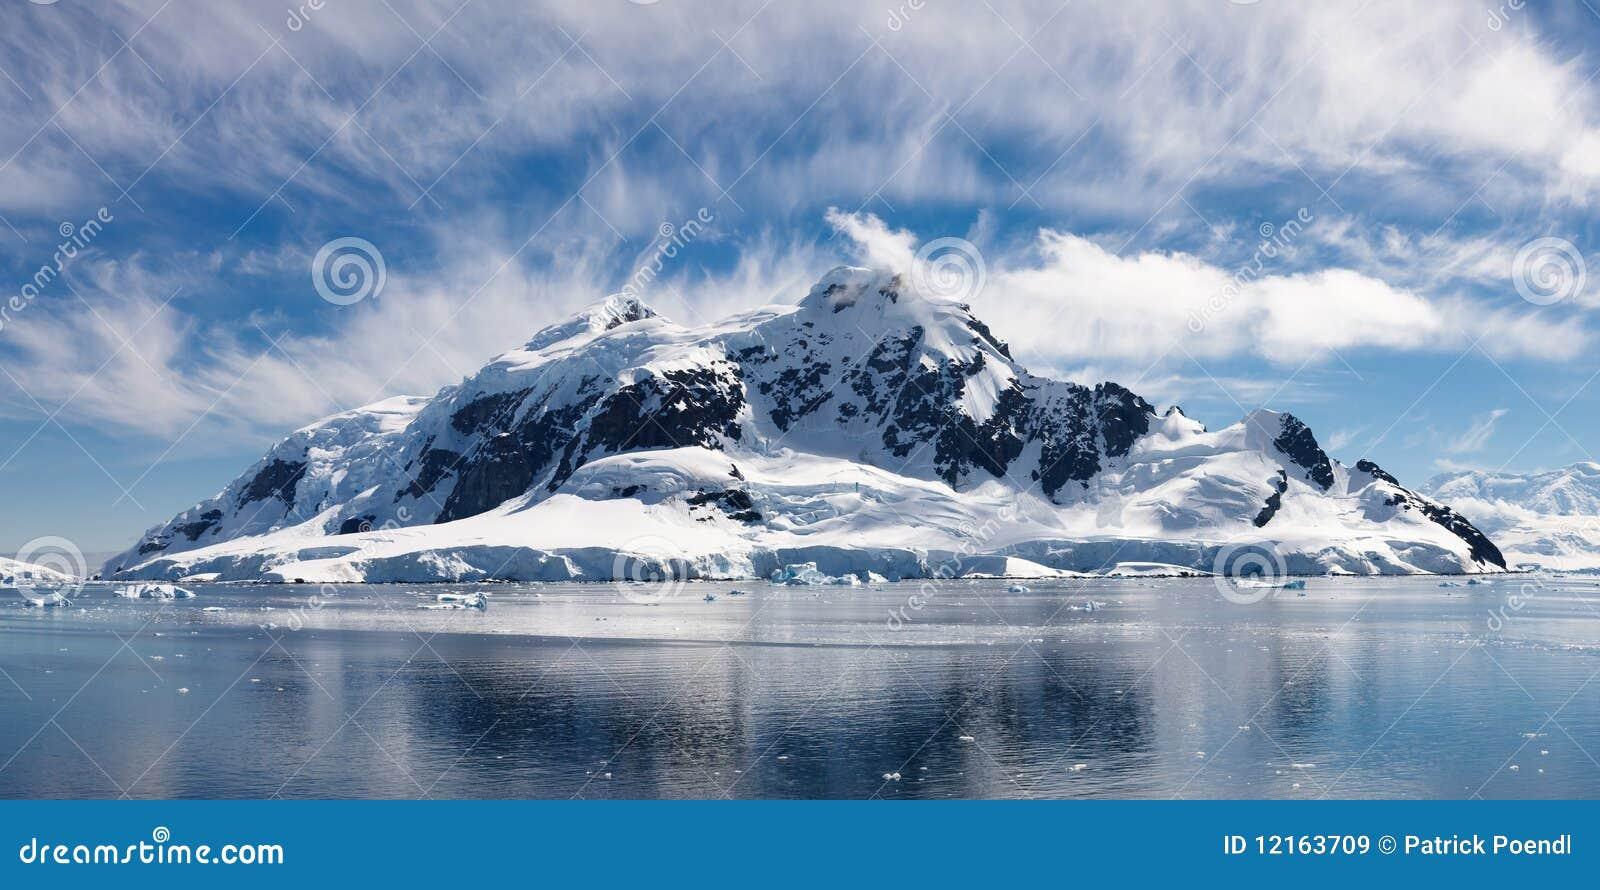 Louro do paraíso, Continente antárctico - país das maravilhas gelado majestoso